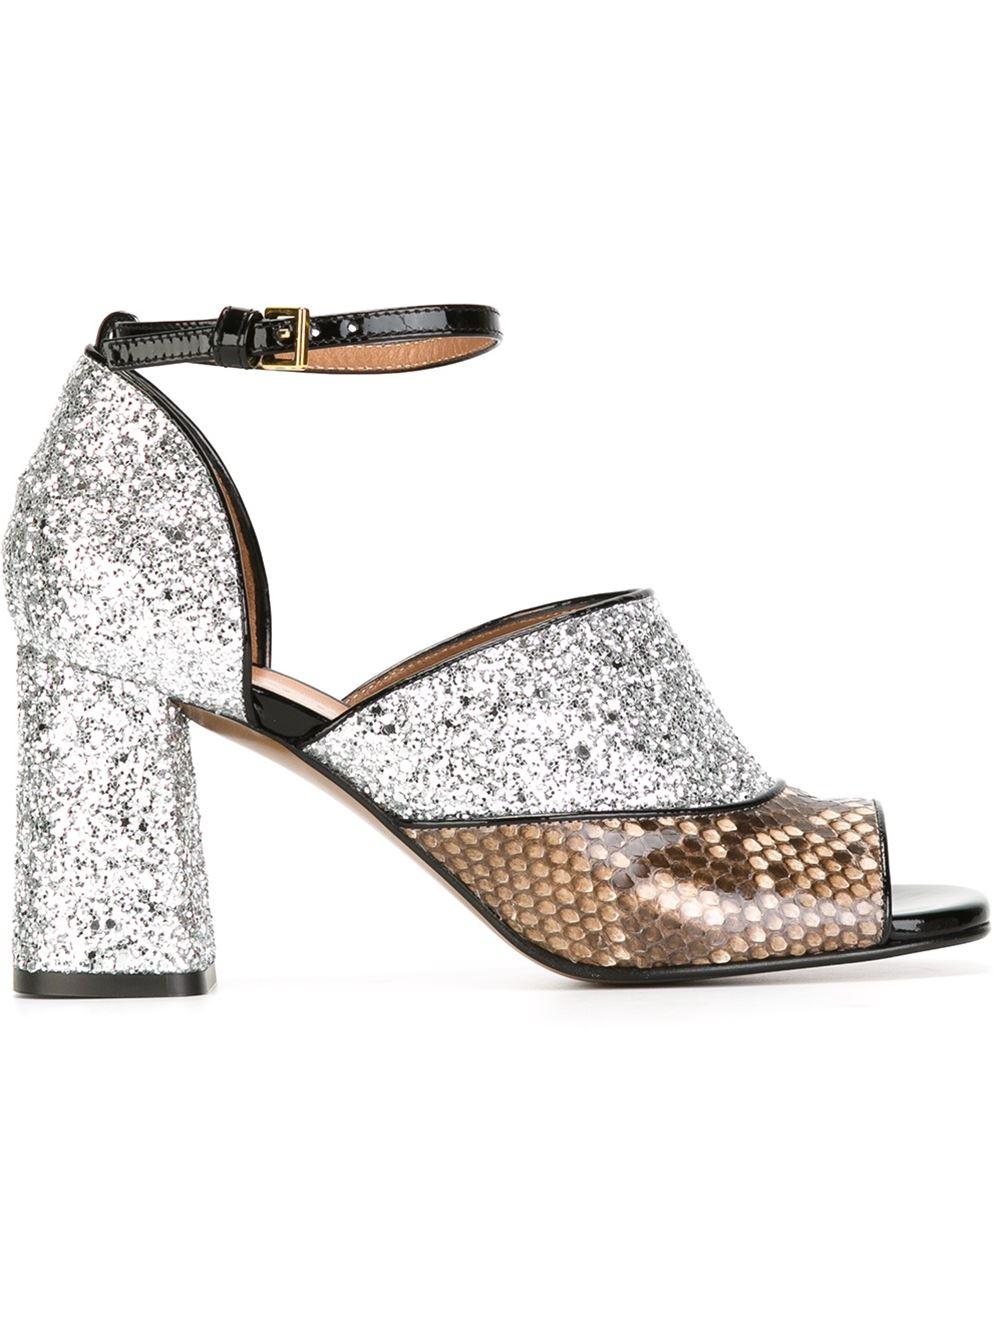 Domiselni salonarji, odprti pri prstih (Marni Chunky Heel Sandals, 630€, farfetch.com)